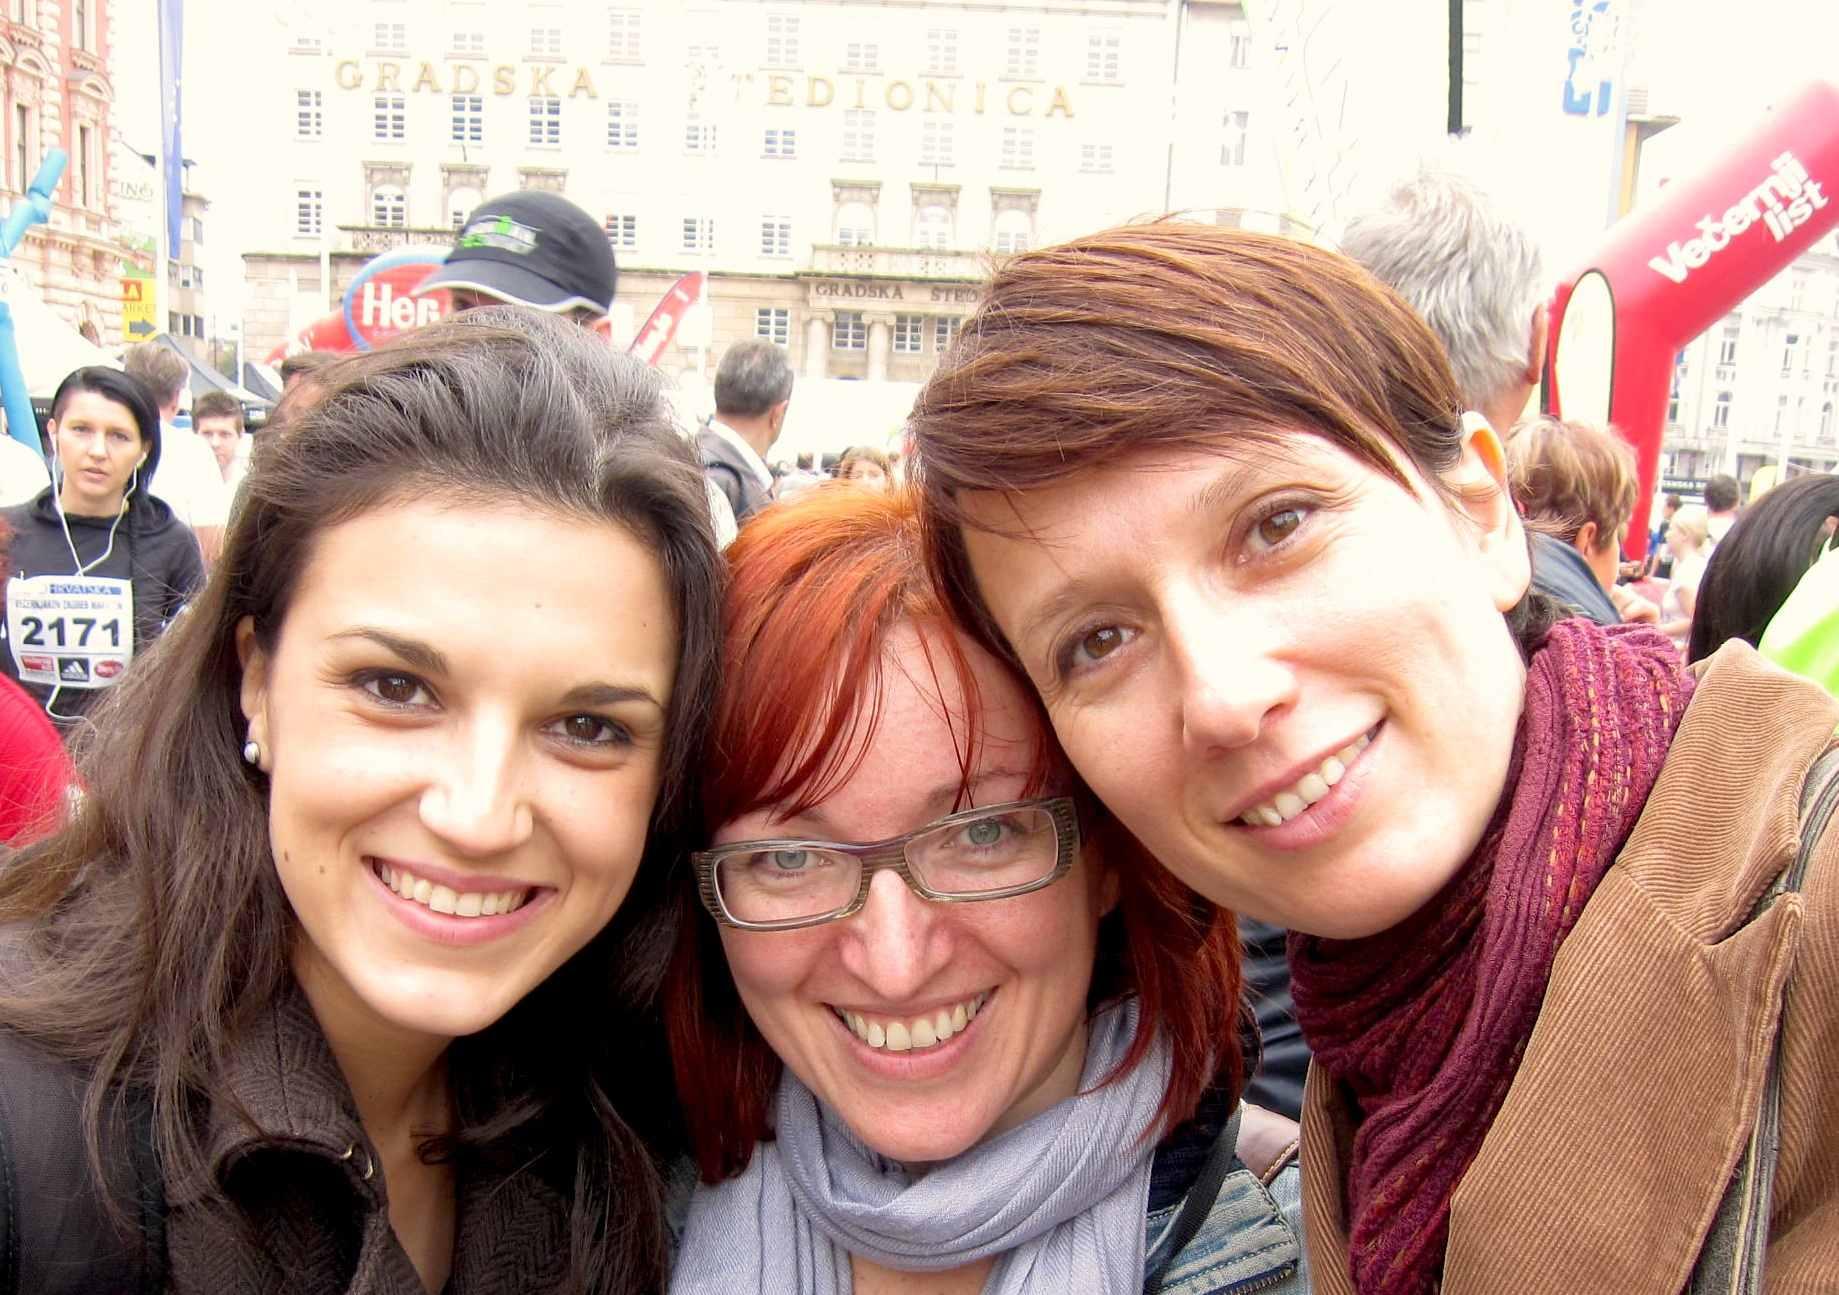 Natalija, Dragana y Beba